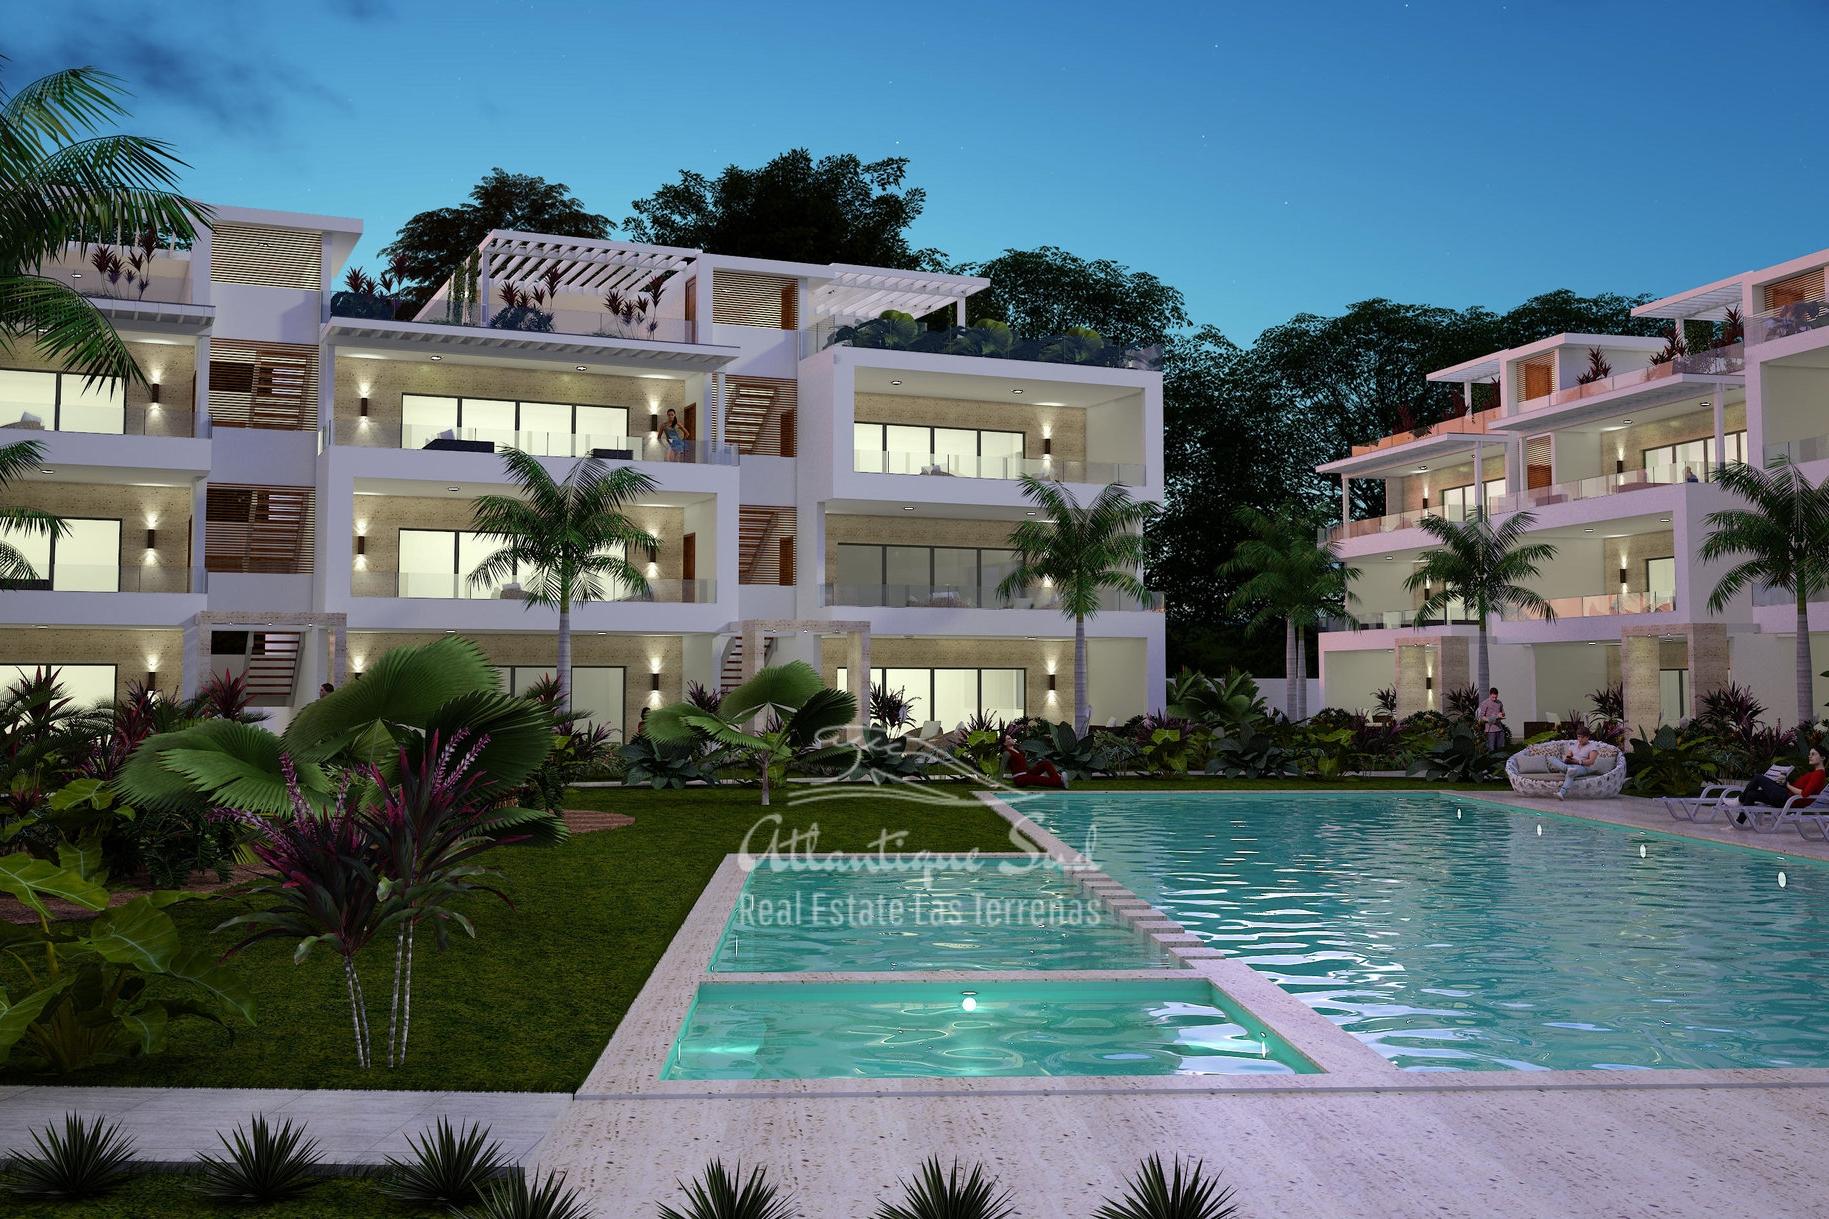 Ultra modern condominium in central location Real Estate Las Terrenas Atlantique Sud Dominican Republic (1).jpg